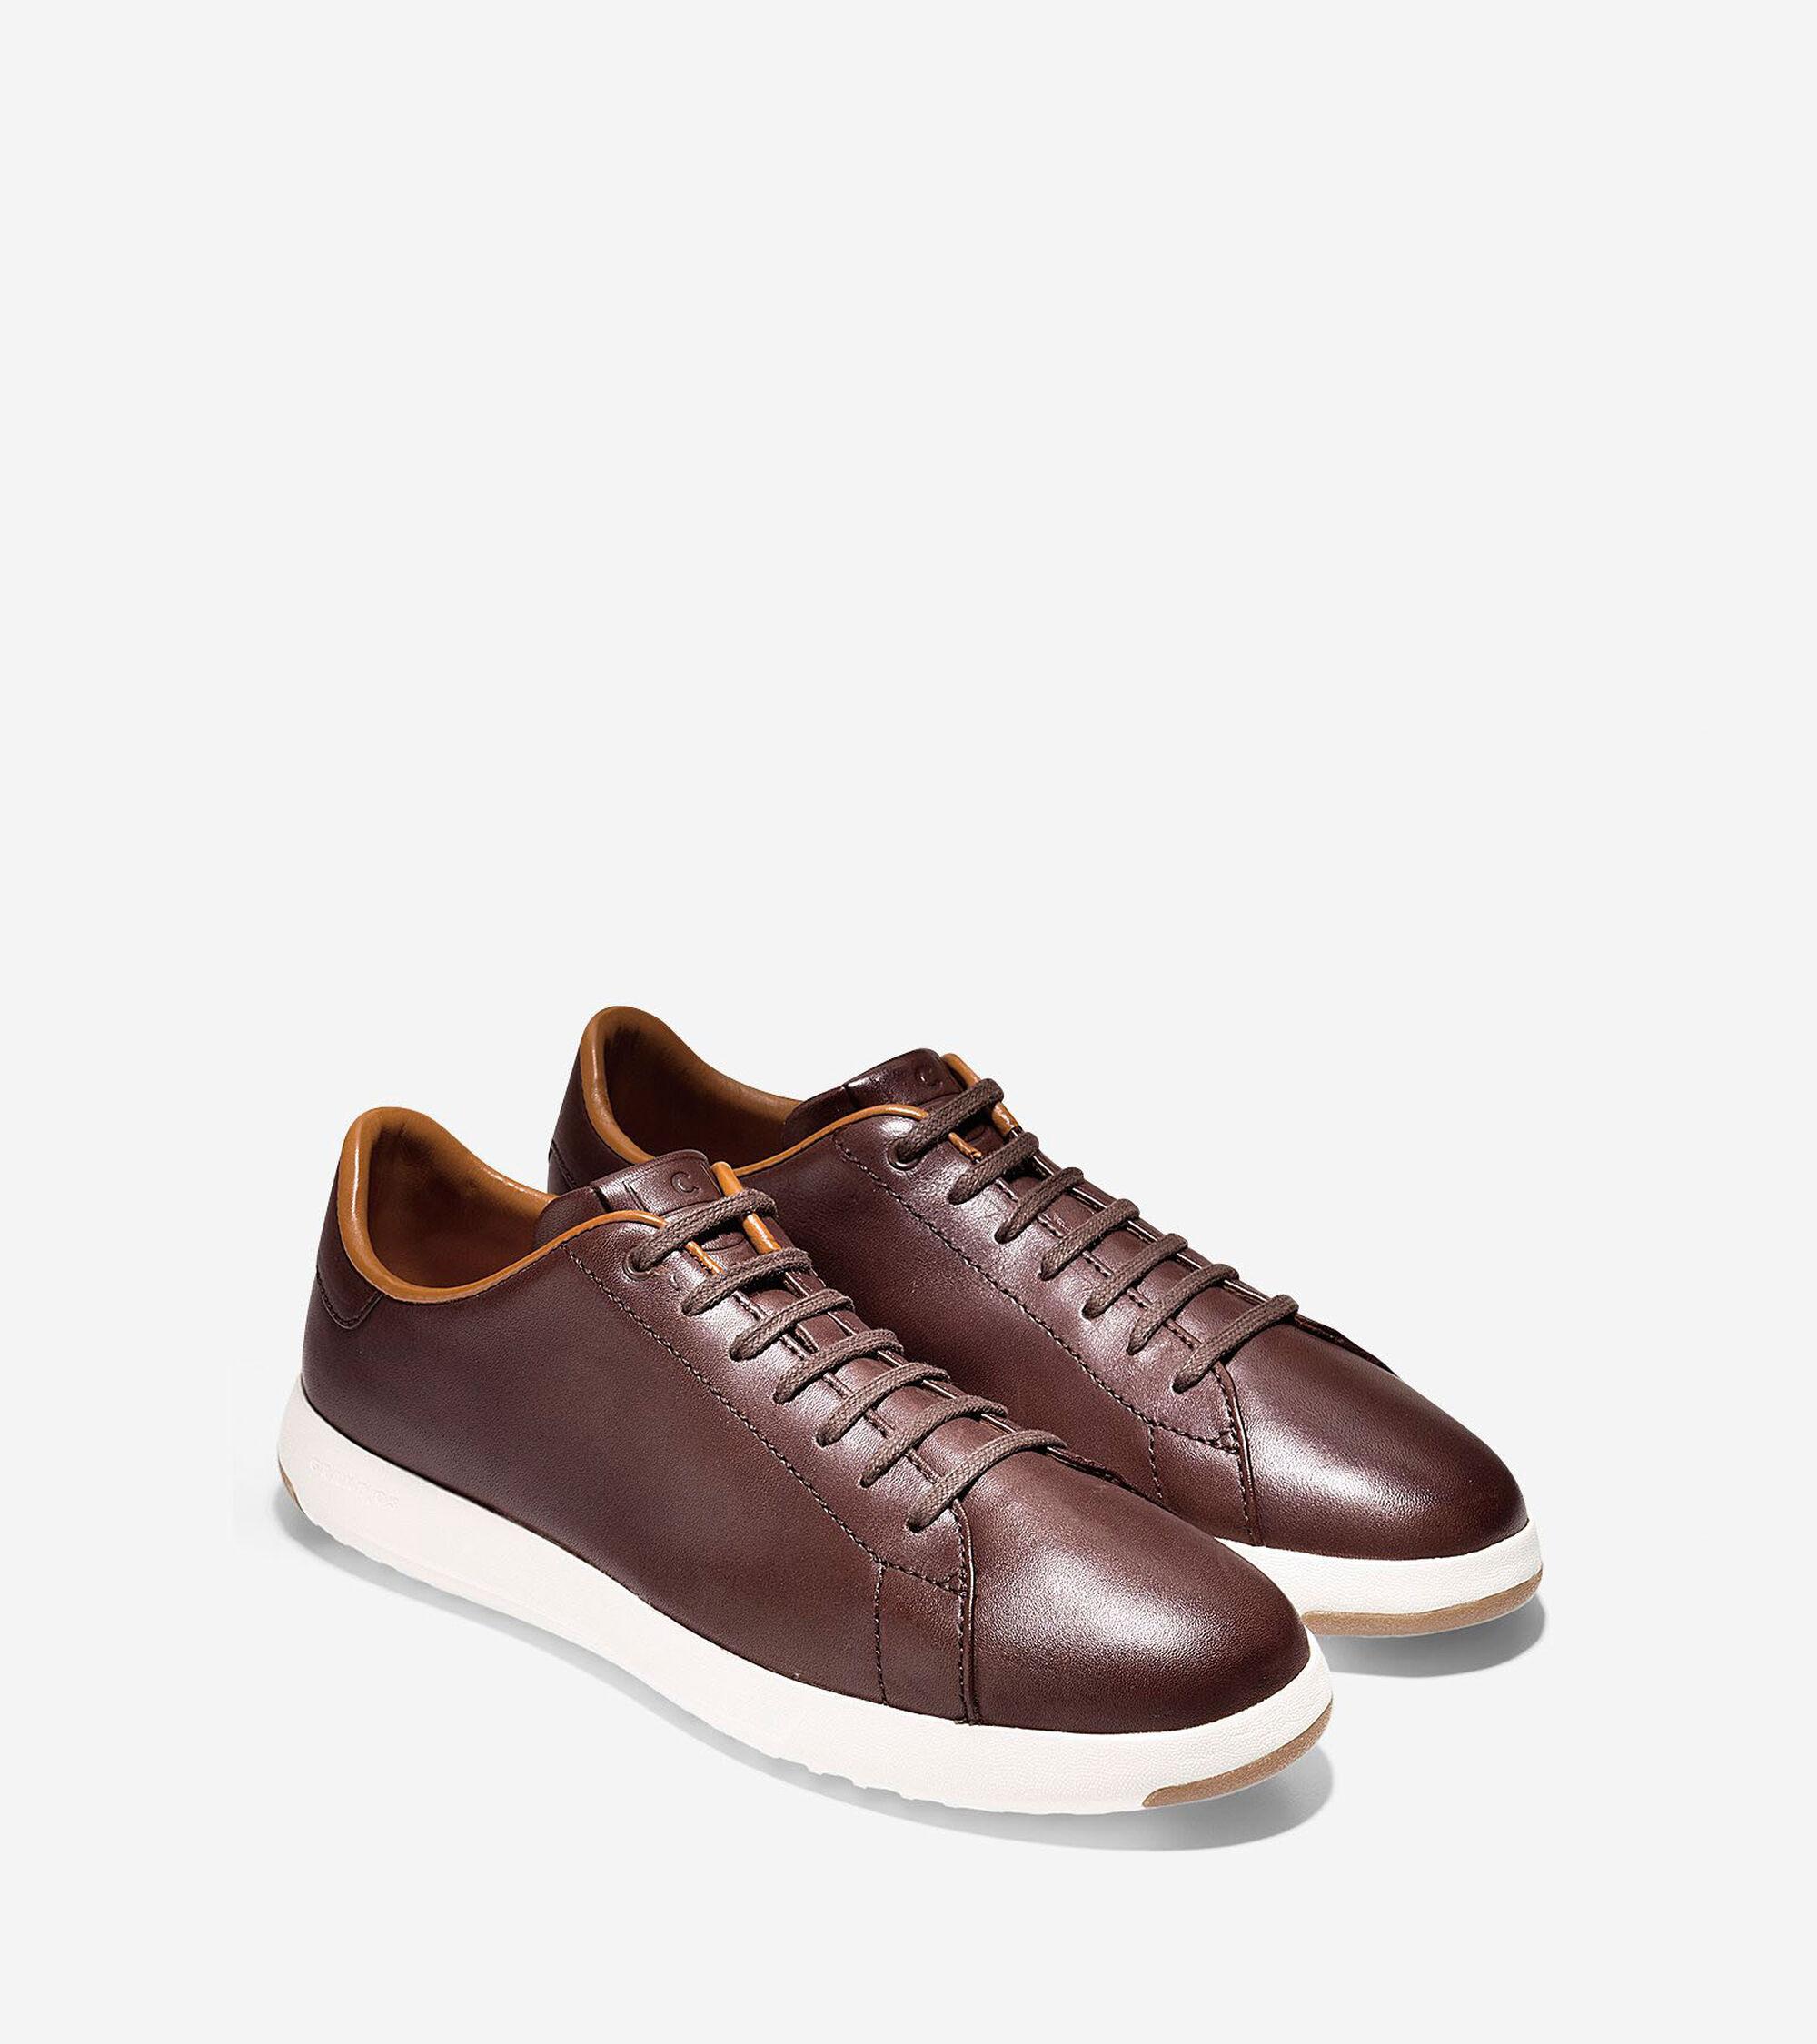 Nike Shoes Raleigh Nc